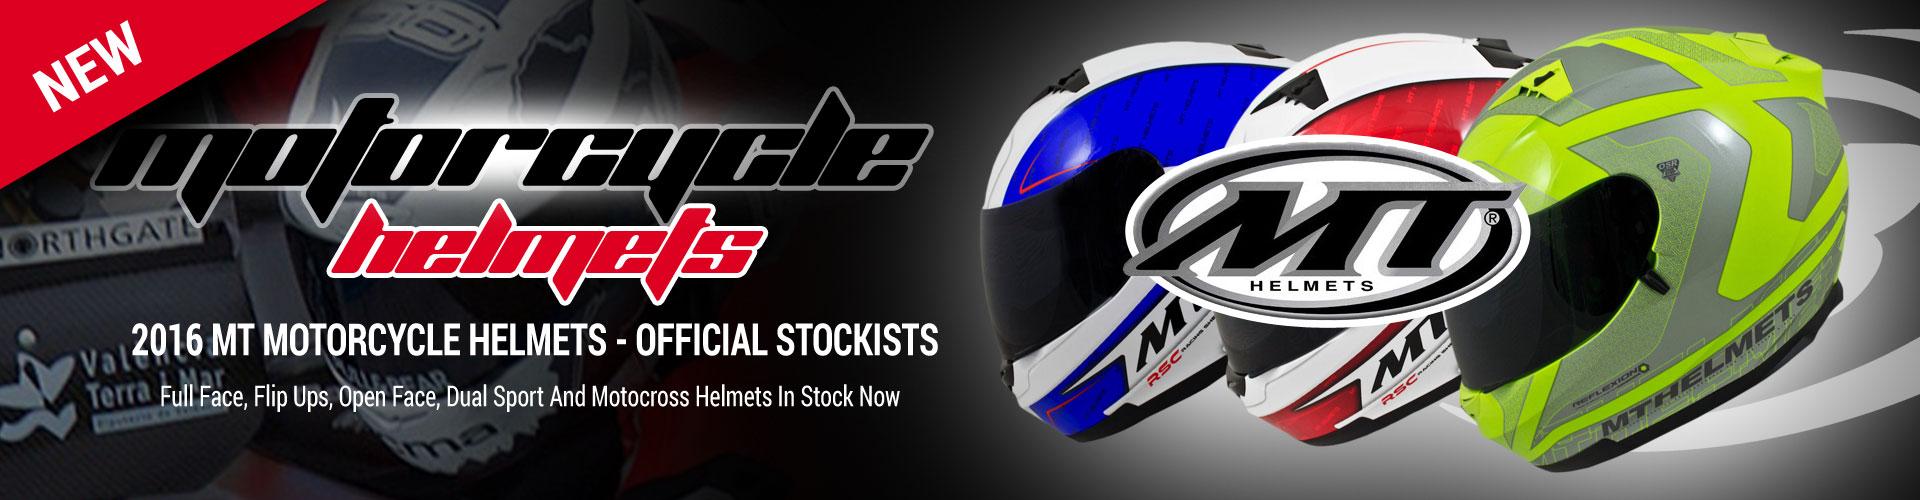 banner-mt-motorcycle-helmets